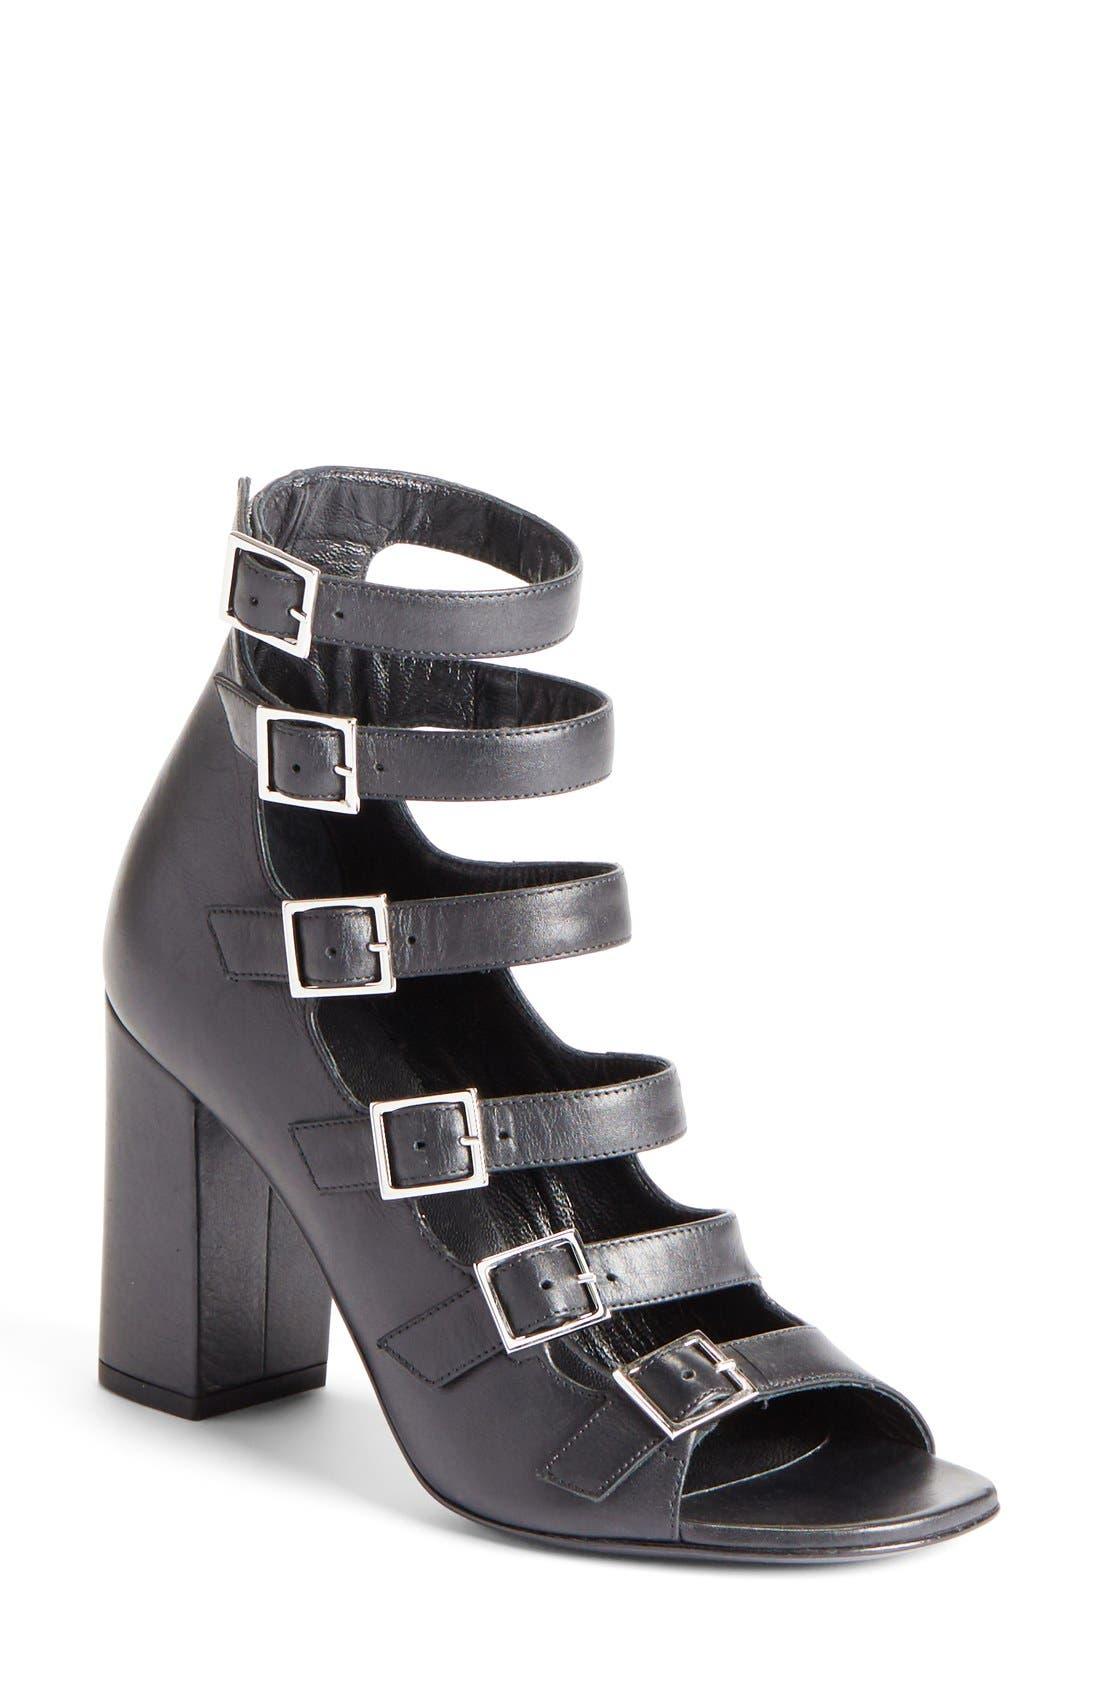 Alternate Image 1 Selected - Saint Laurent 'Babies' Buckle Strap Sandal (Women)